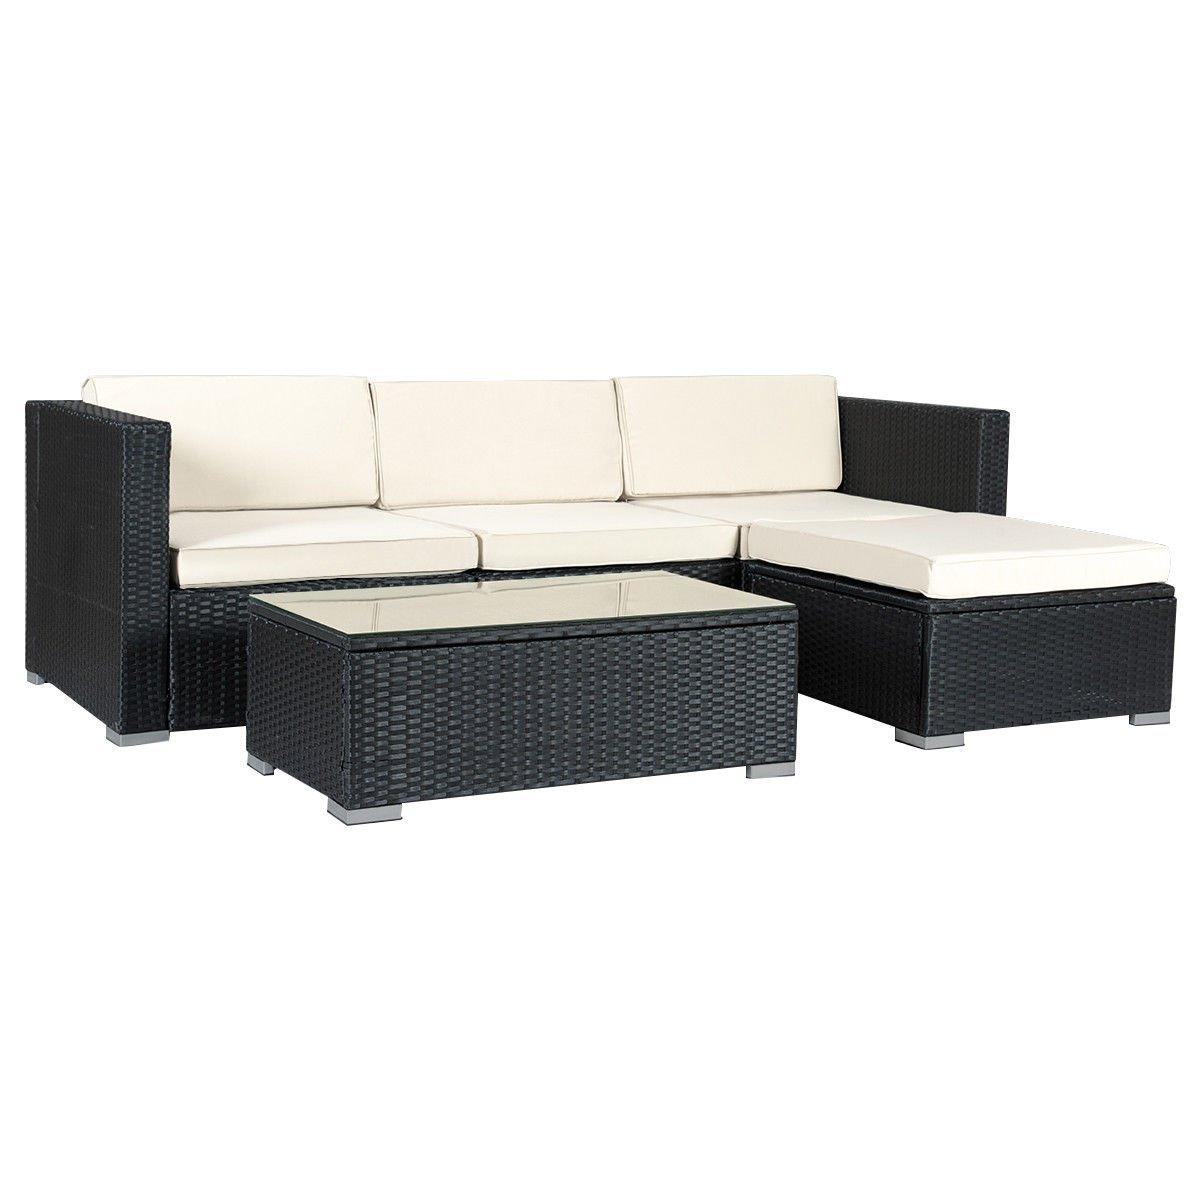 Get Quotations 5pcs Black Rattan Table Furniture Set Armless Chair W 2 Corner Sofa Footstool